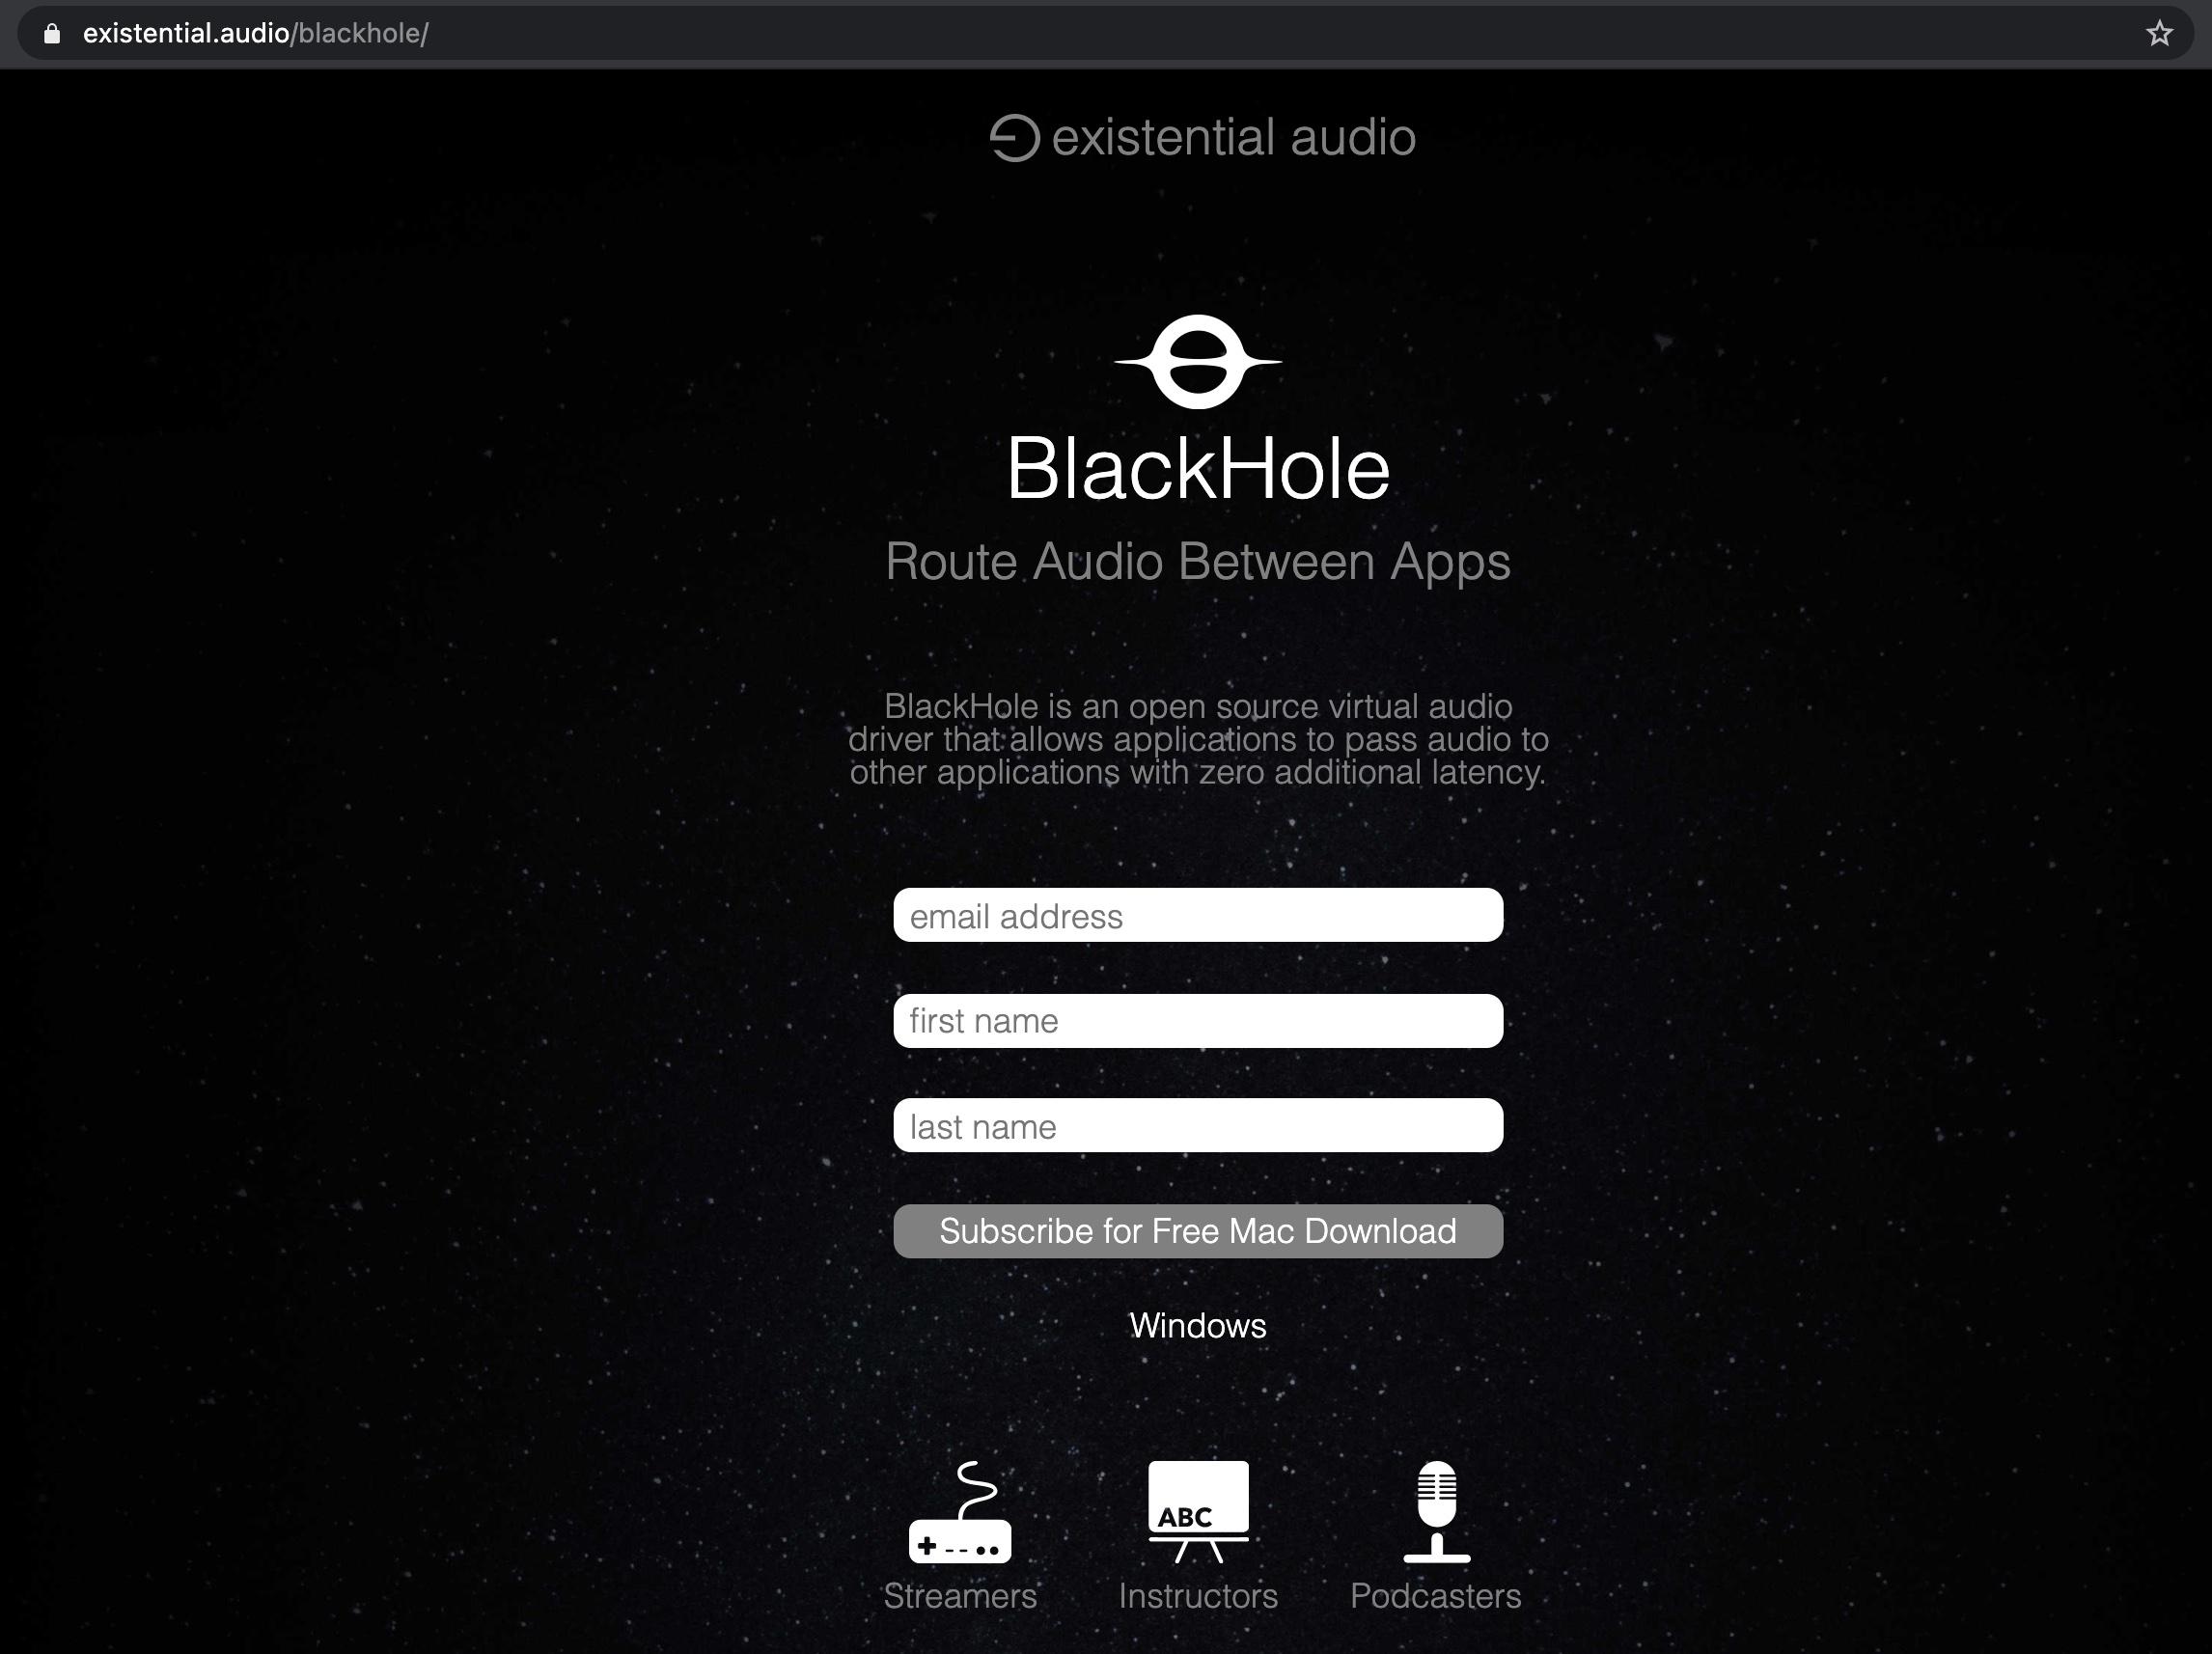 blackhole pic.jpg